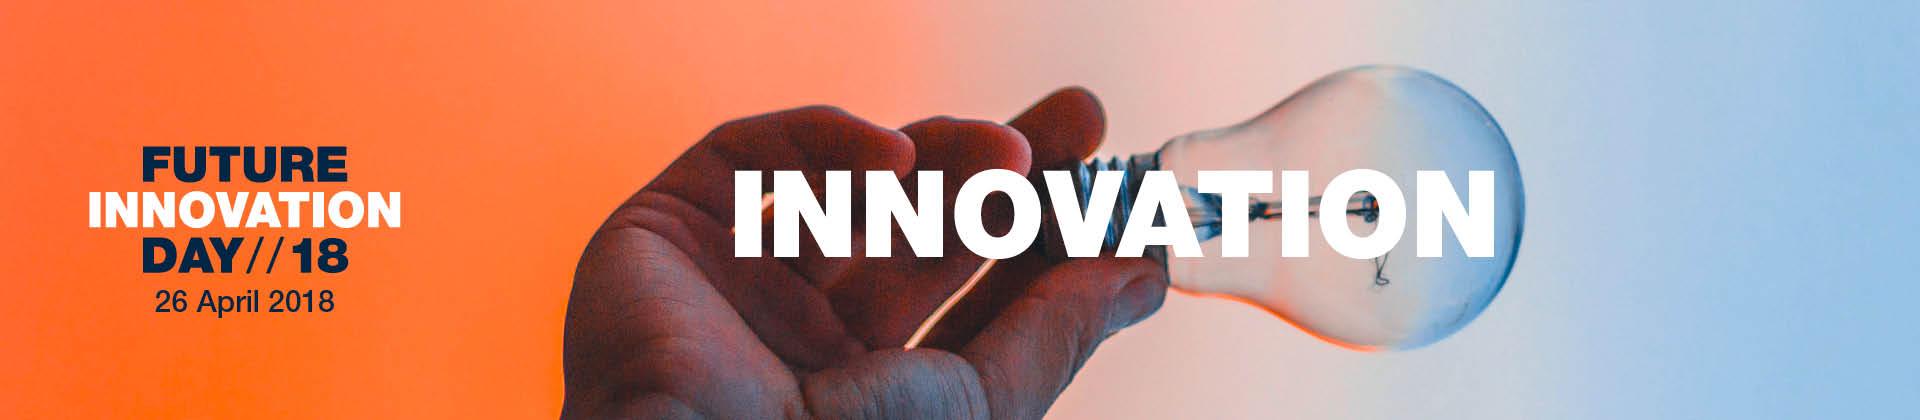 Future Innovation Project - INNOVATION